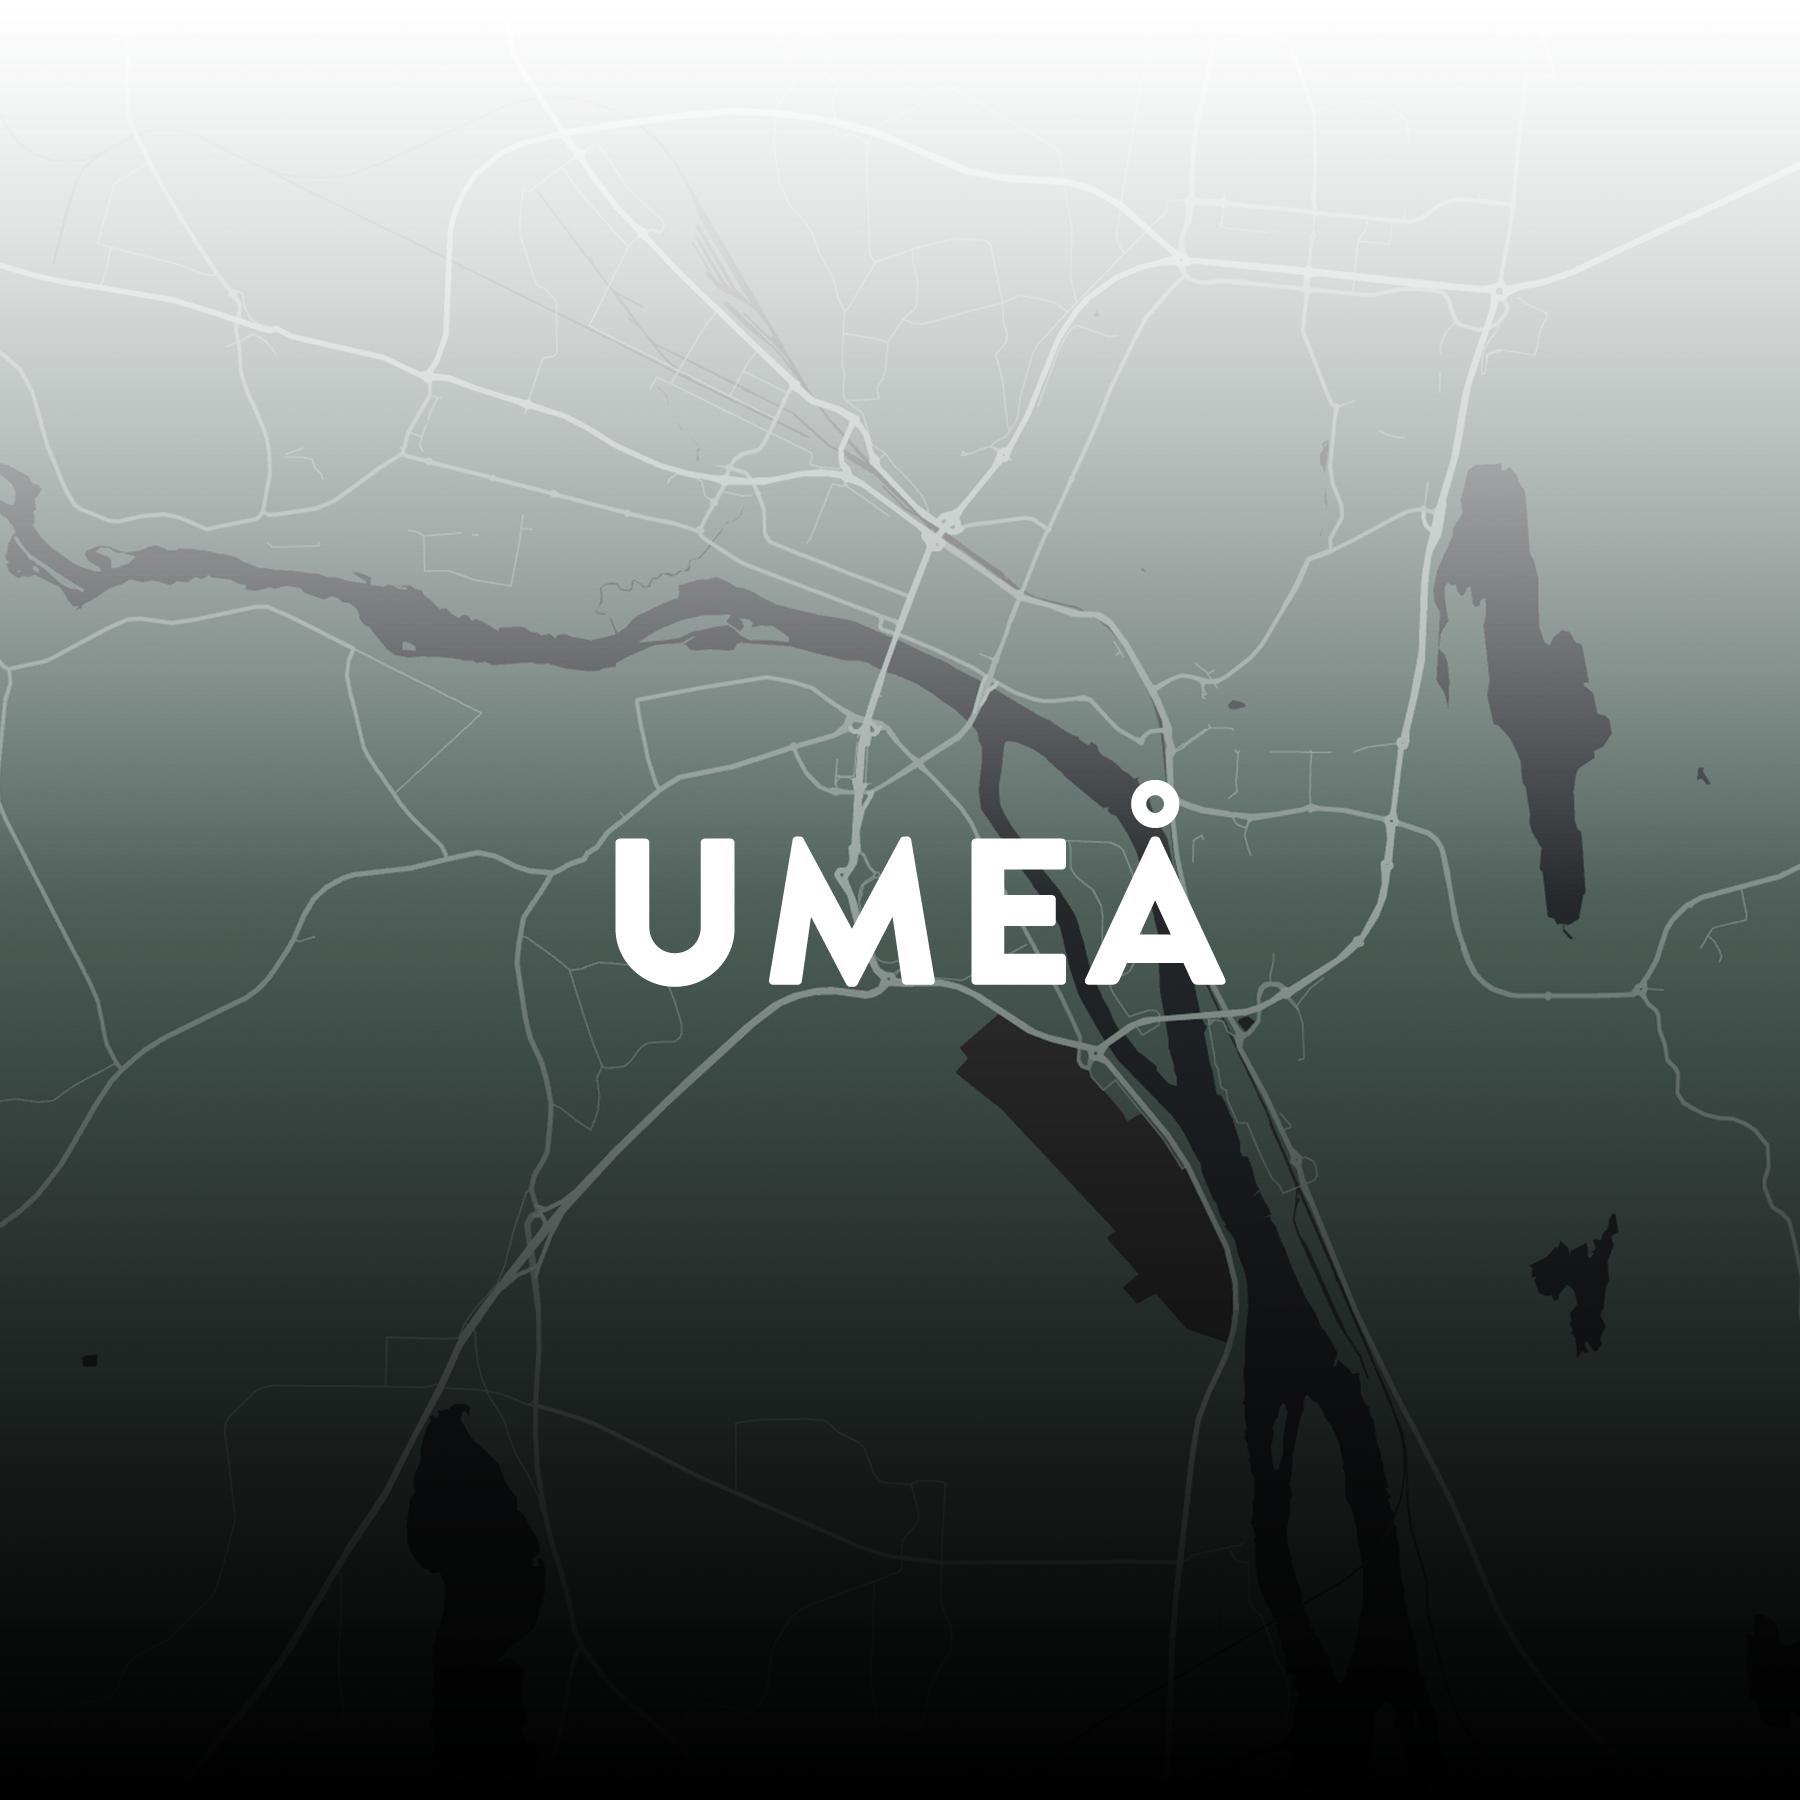 Let's Fika... Umeå featured Image